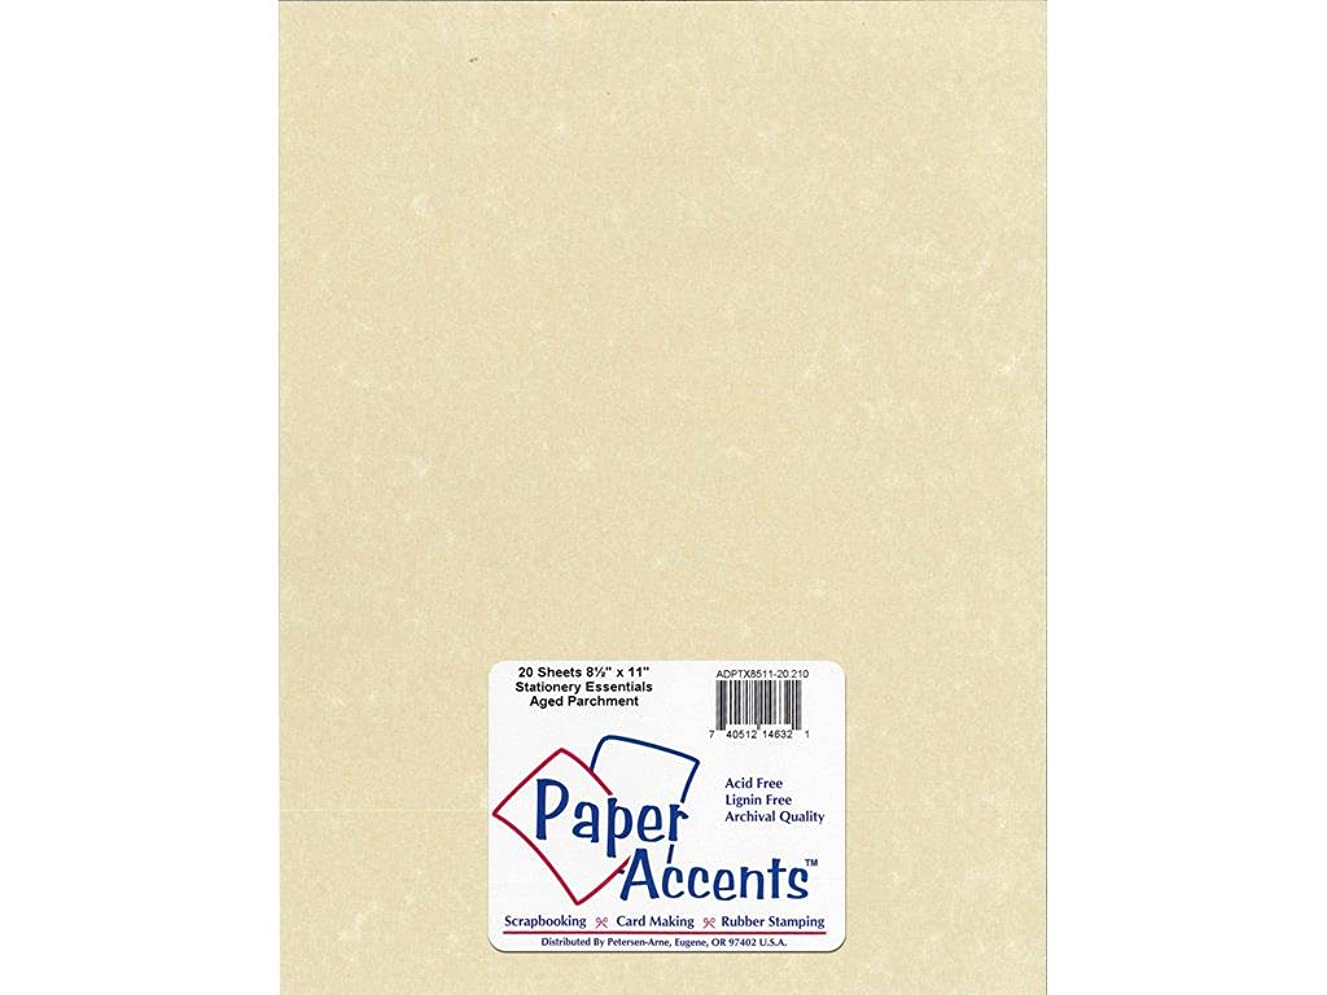 Accent Design Paper Accents Lite Stock 8.5x11 LiteStk Parch Aged